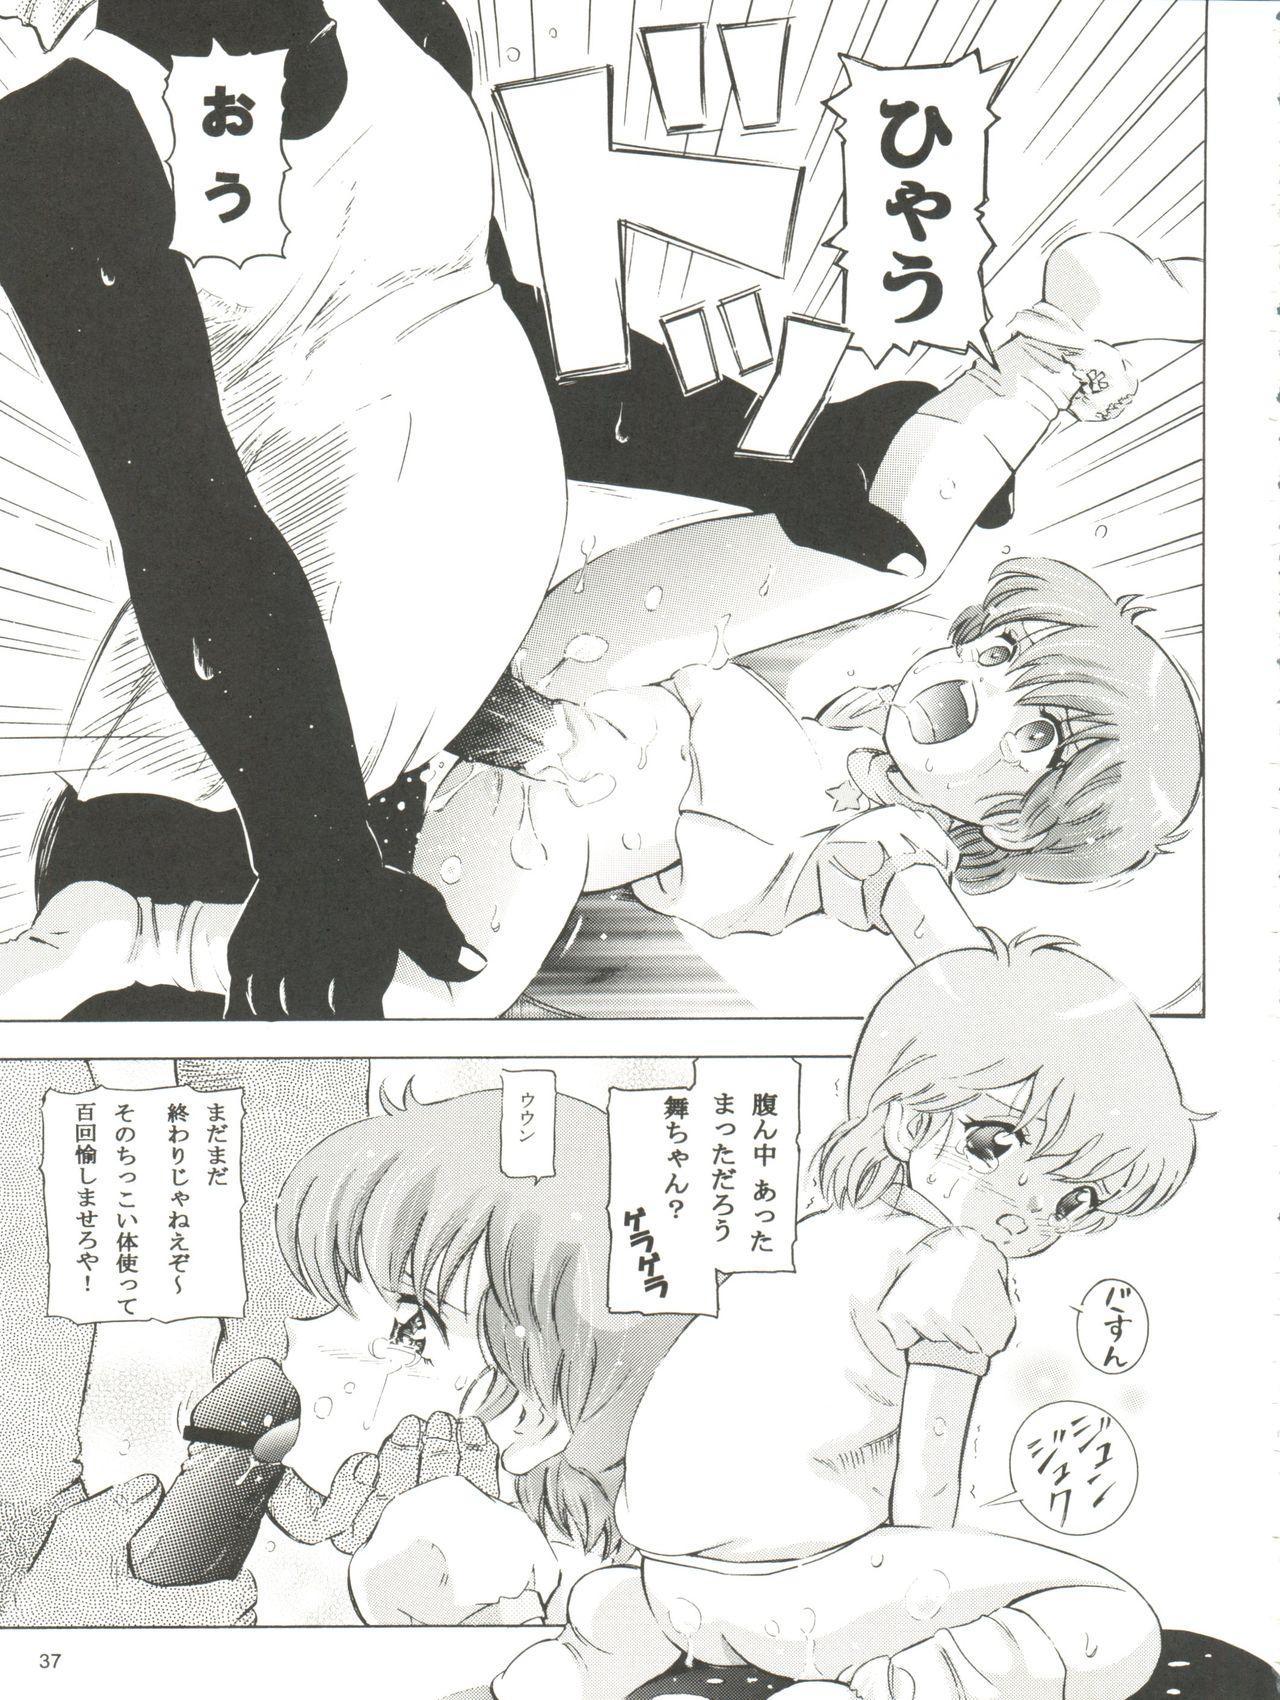 Mahou Kyuushiki 15 36